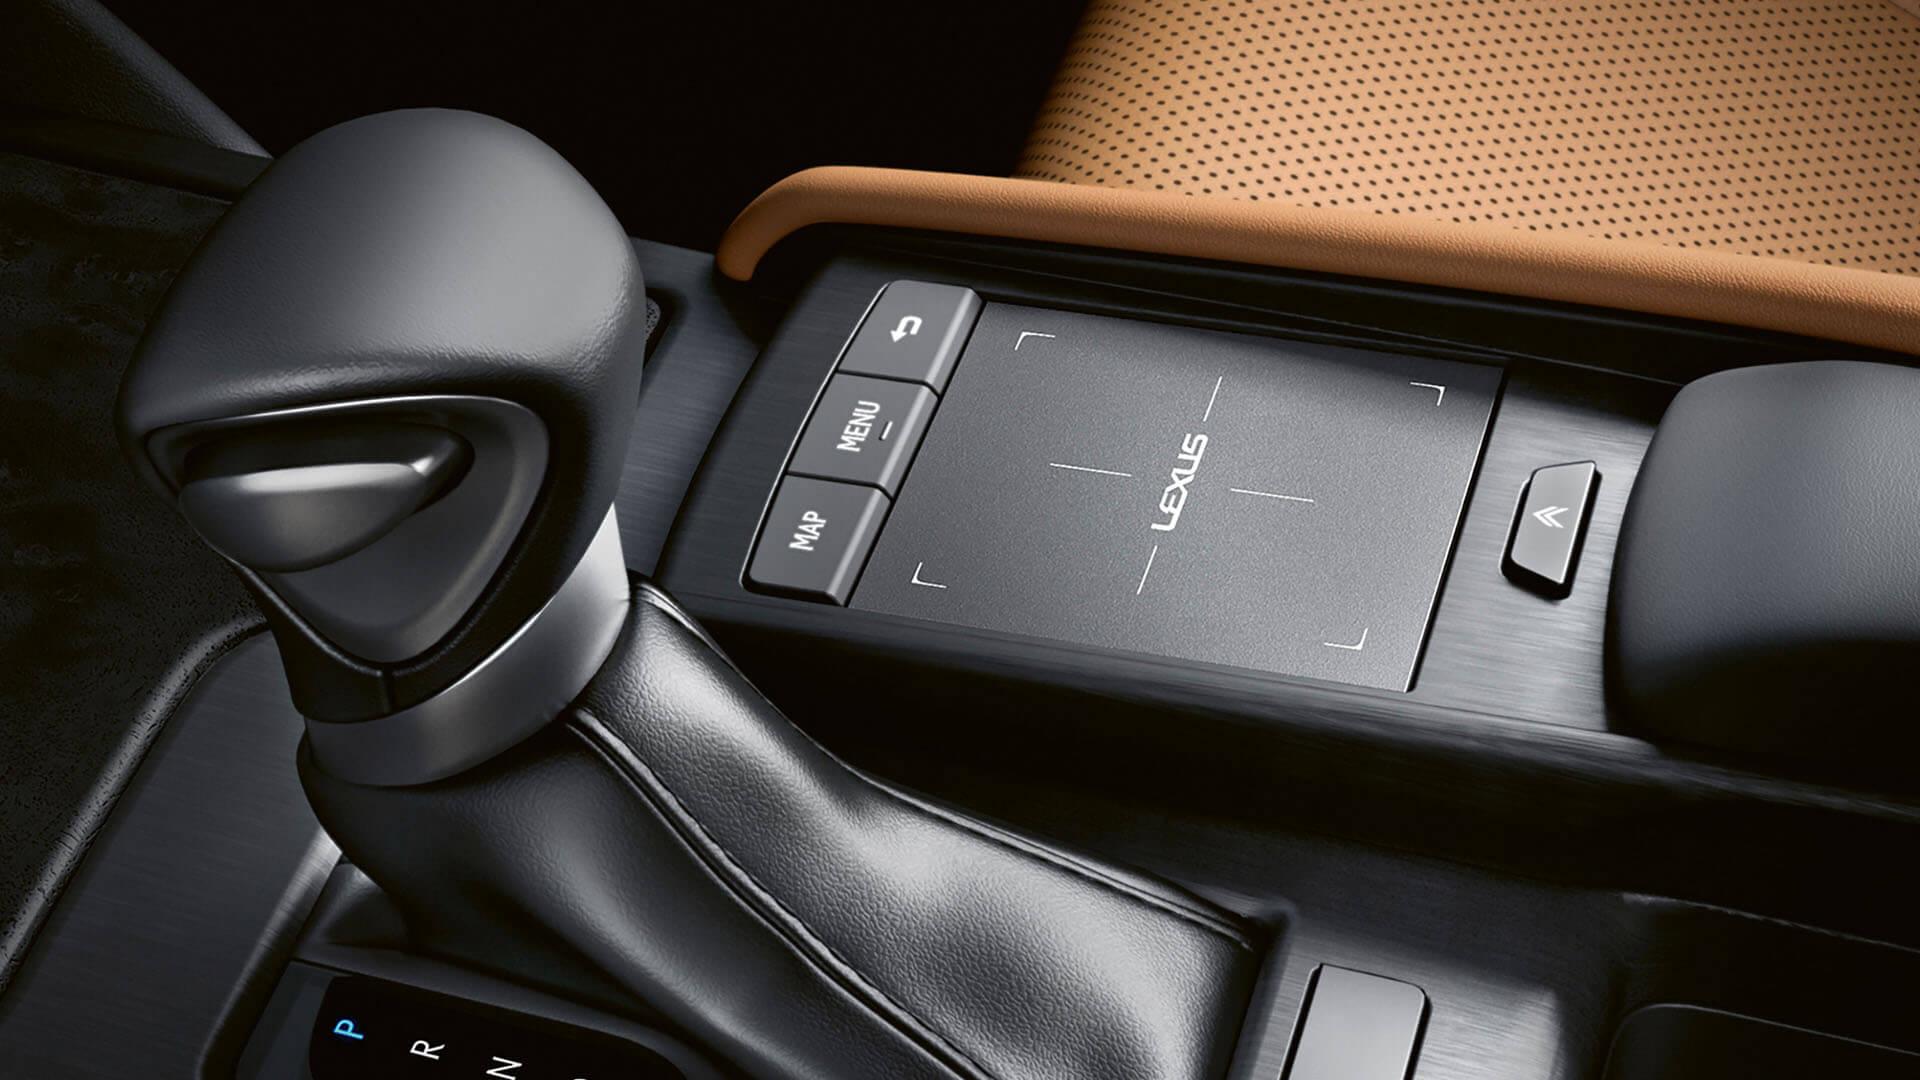 2022 RU lexus es experience interior front touch pad